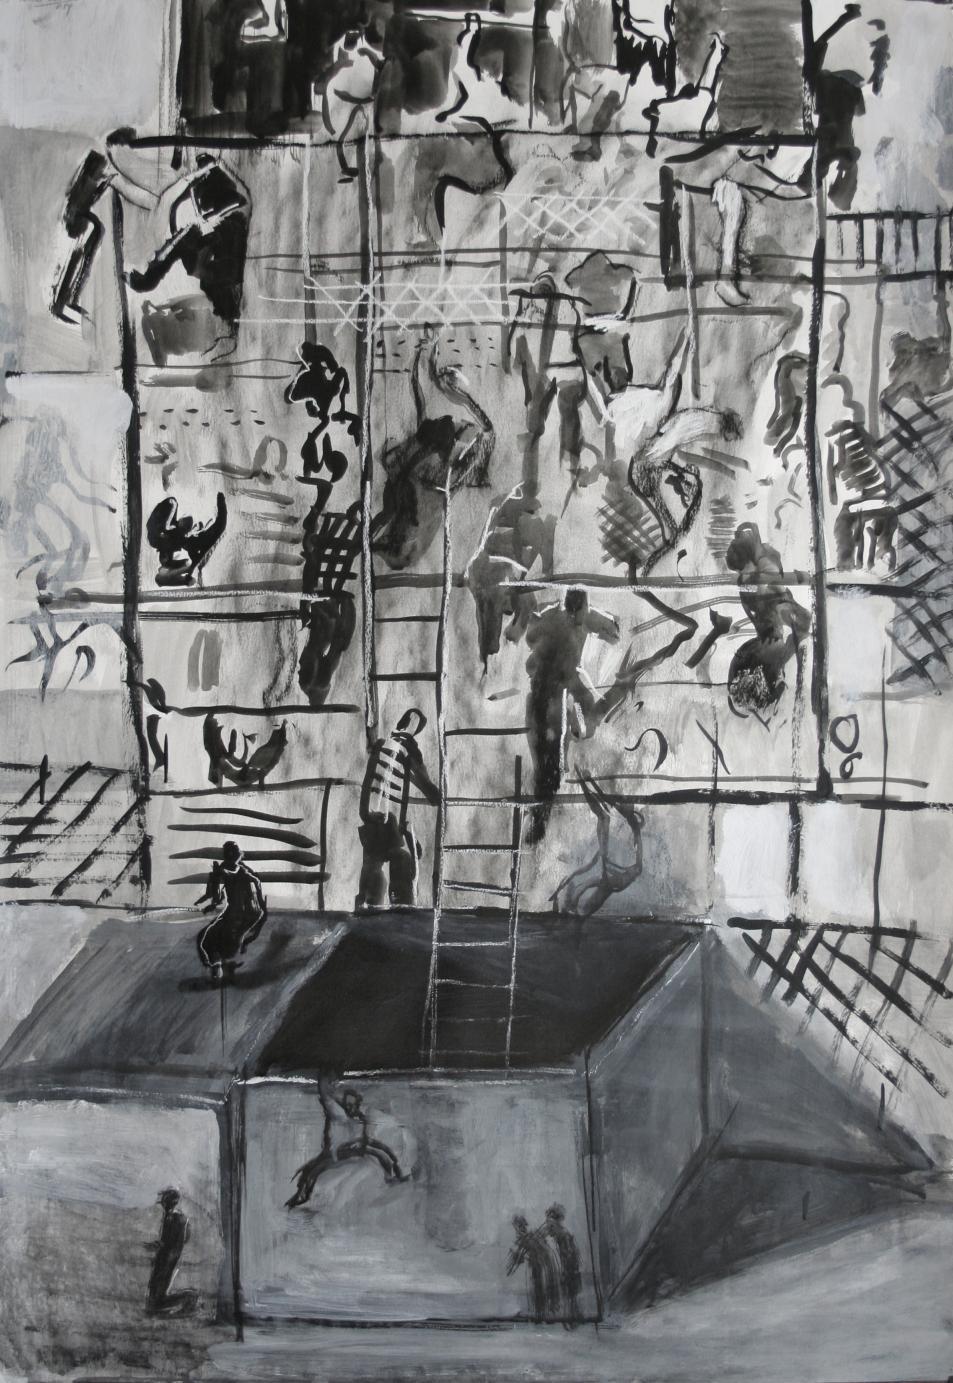 El asalto I (2014) - Rafael Alvarado